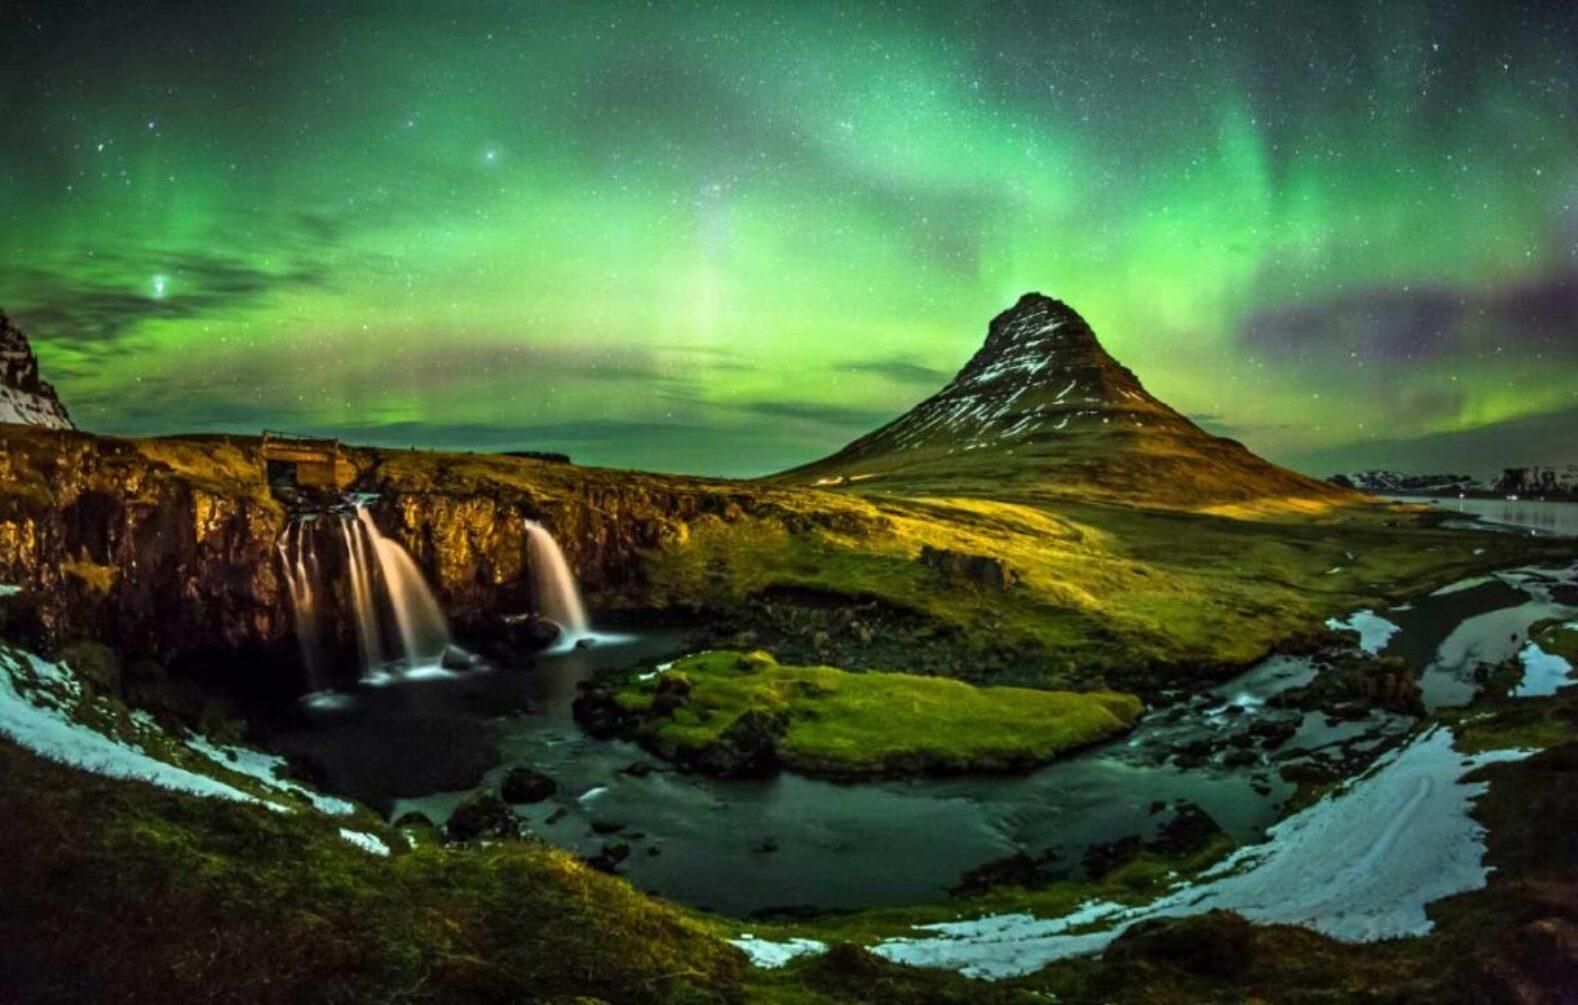 Day-075-Aurora-Nova---Book-of-Views-Loch-Halmond